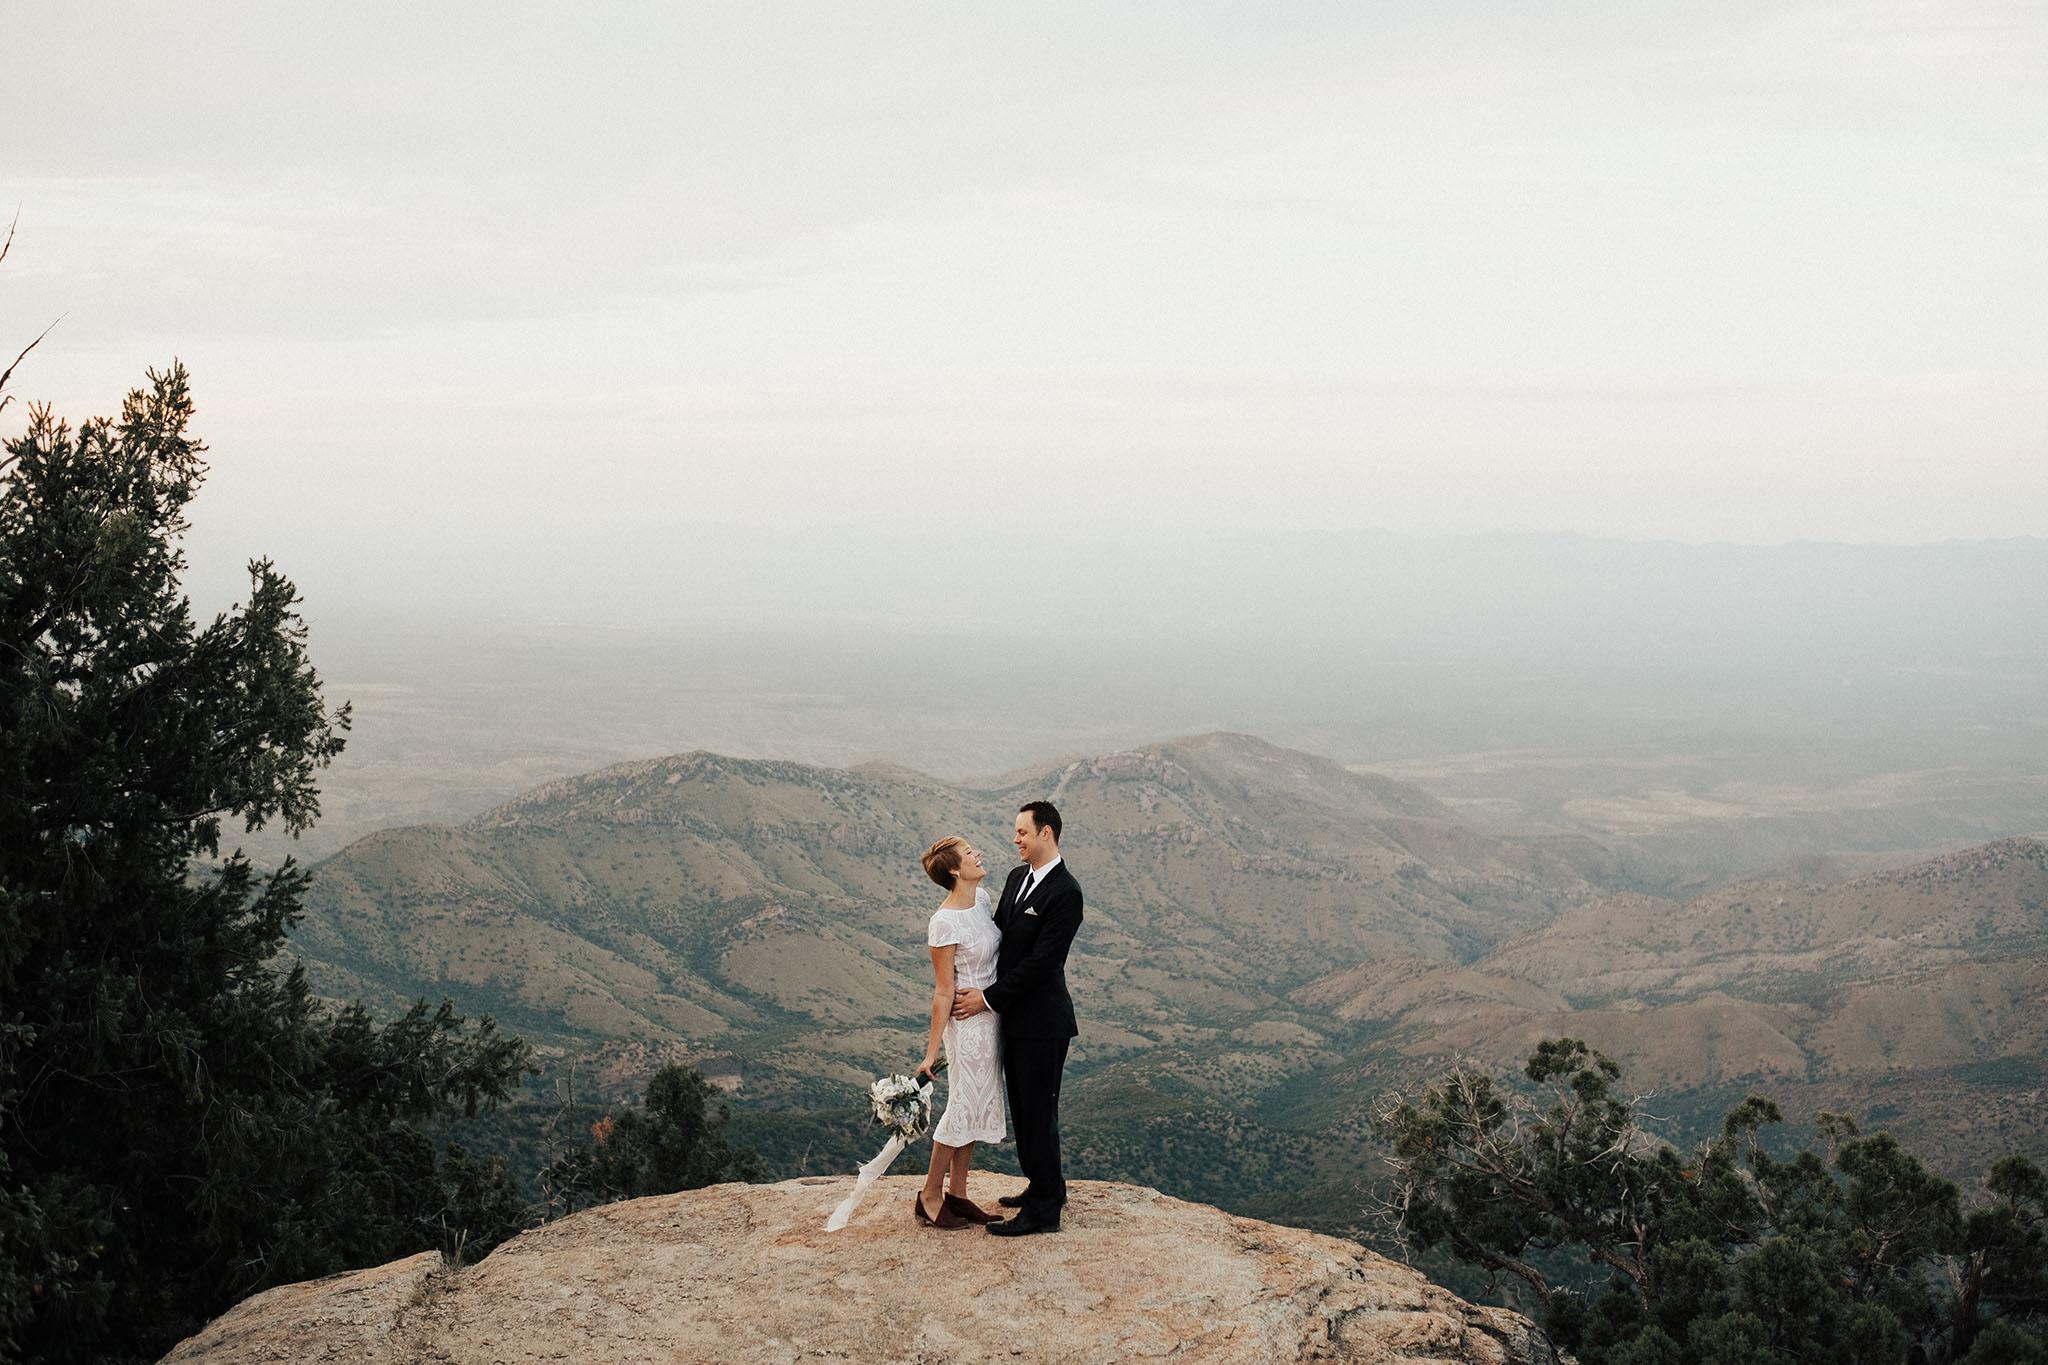 Arizona-Intimate-Elopement-Adventure-Photographer-Mount-Lemmon (33).jpg